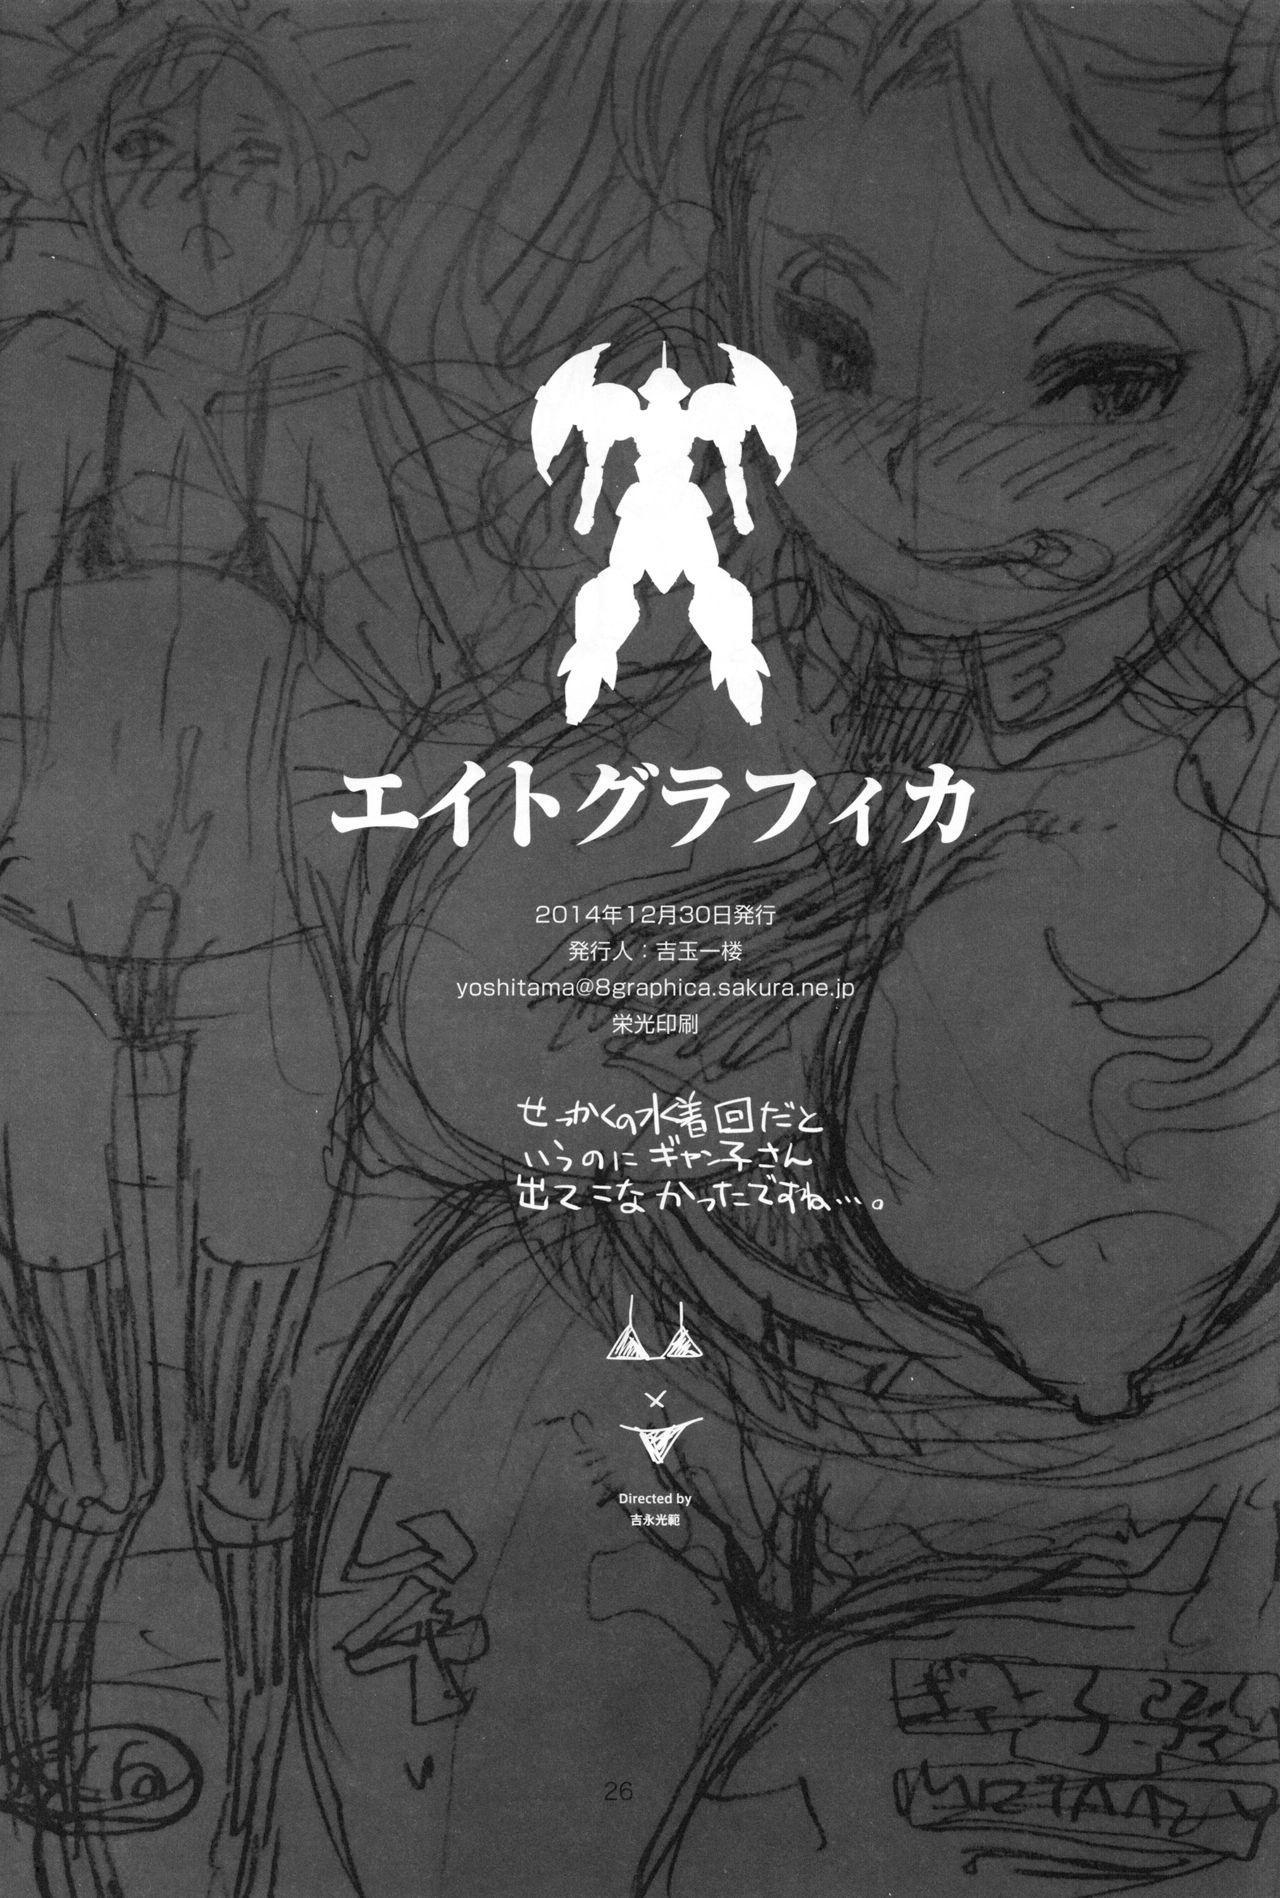 METABOLISM G Hatsujou Gyanko no Nikushoku Fudeoroshi + NTR | 肥滿主義G 發情強子的肉食開苞+NTR 25